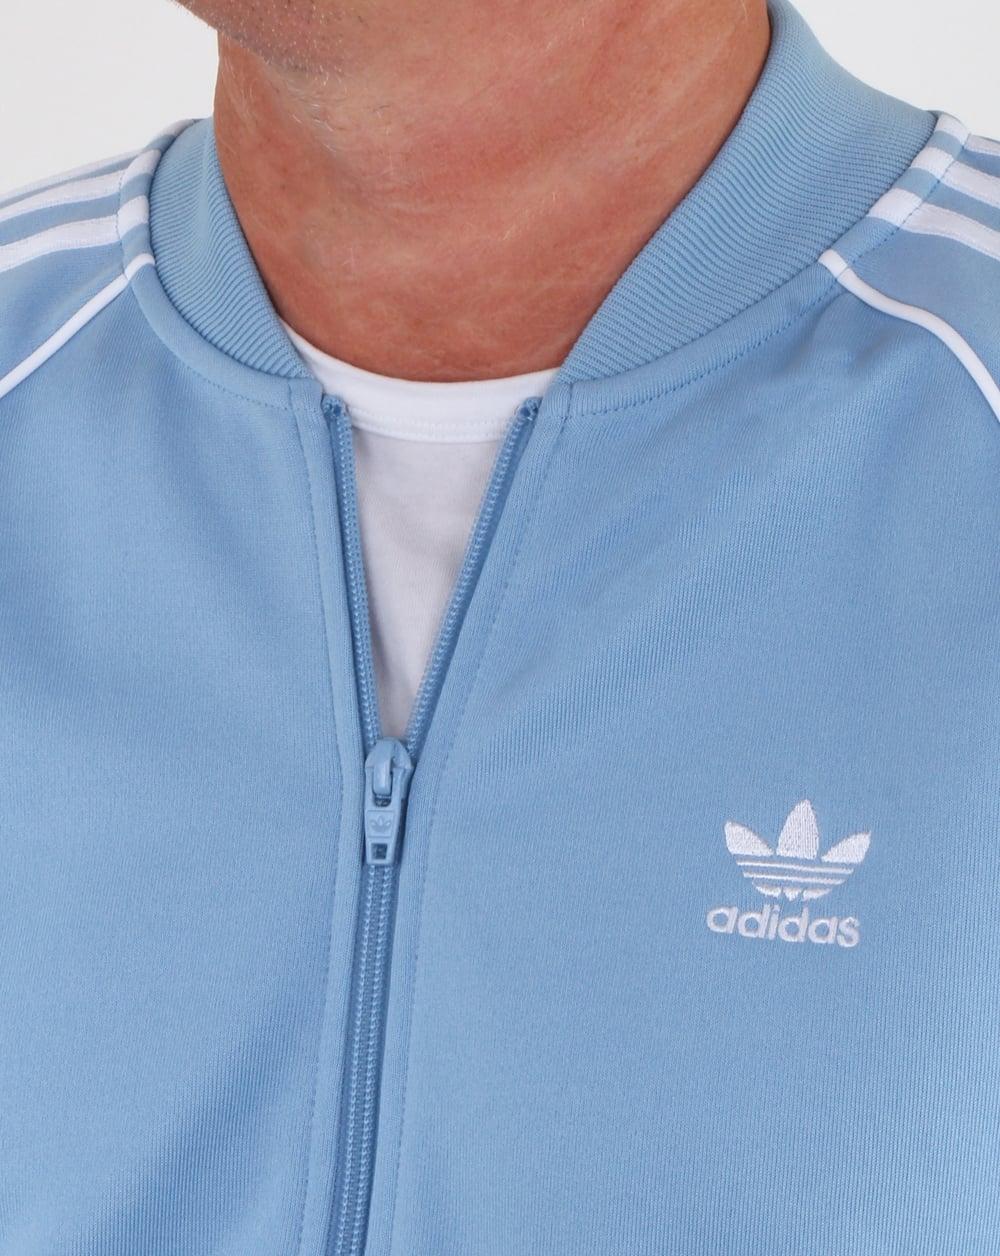 02a562f20 Adidas Originals Superstar Track Top sky, jacket, tracksuit